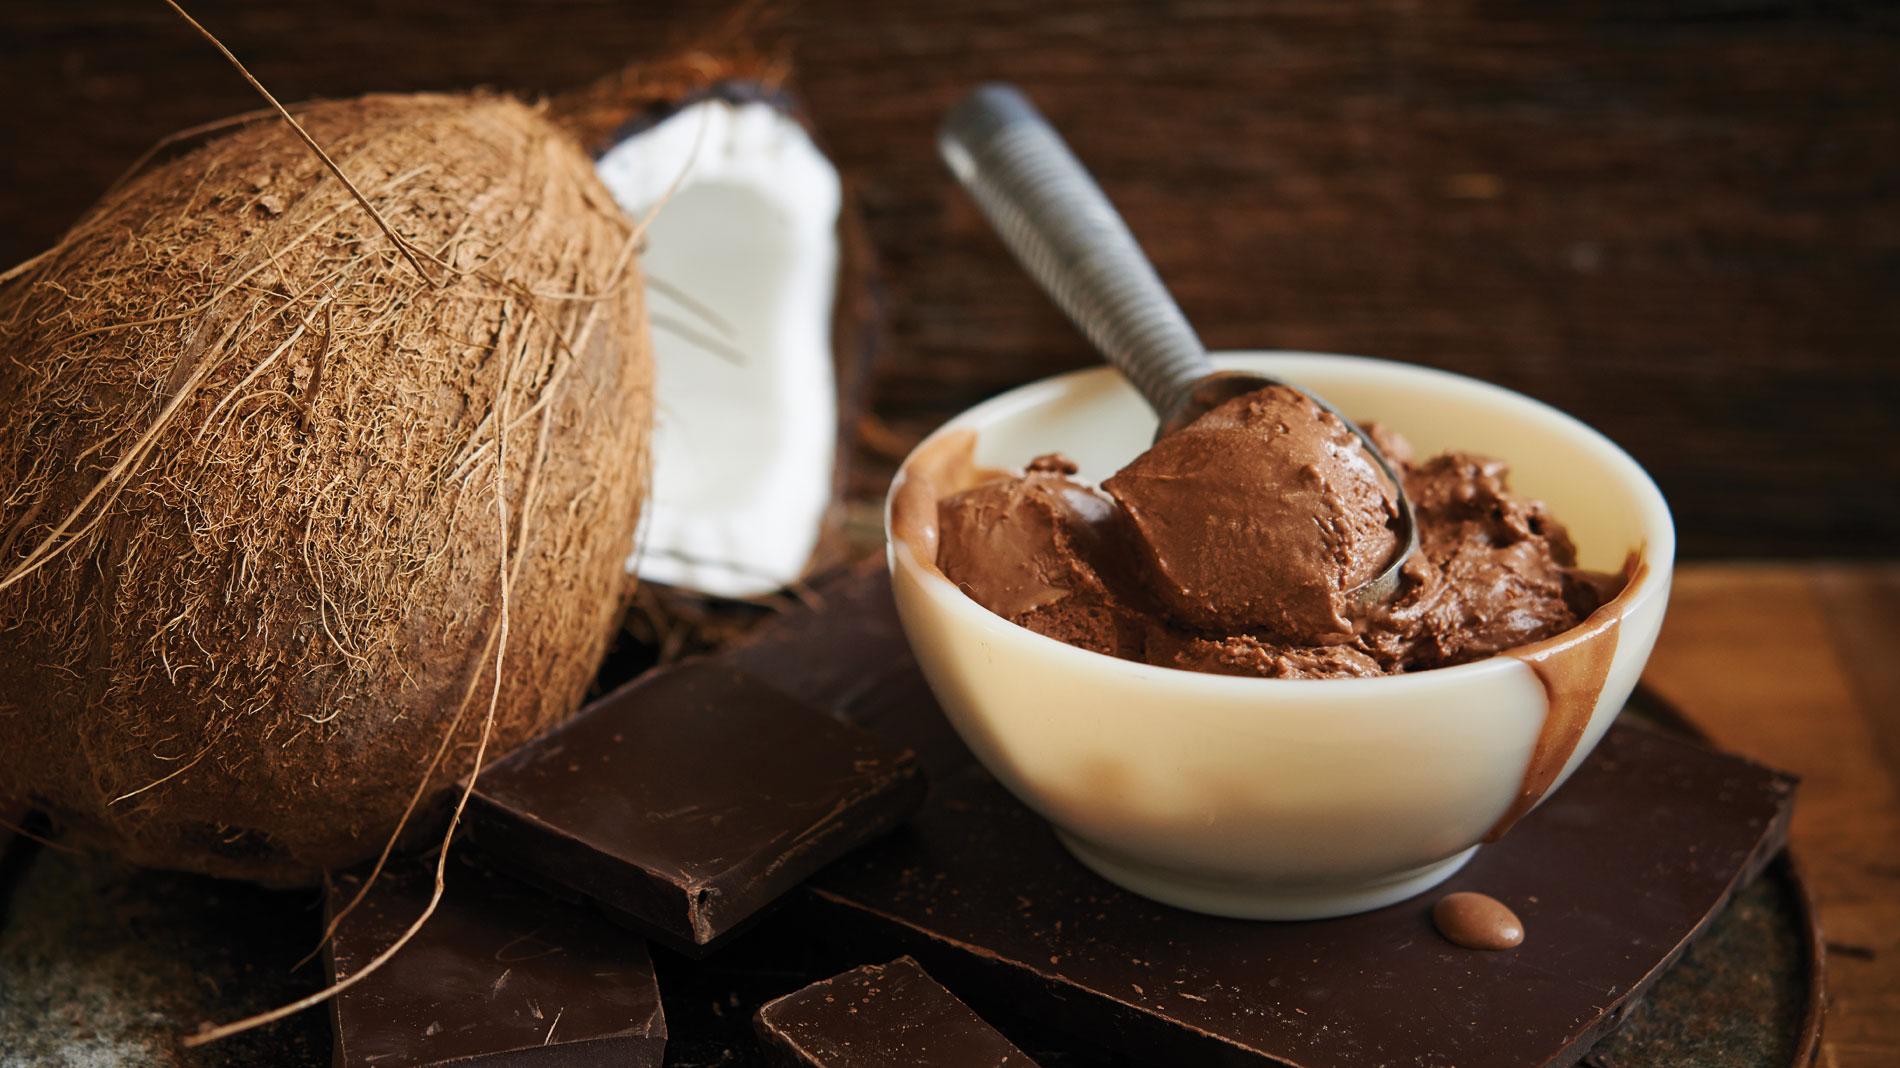 vegan chocolate coconut fudge ice cream at clementine's creamery in st. louis